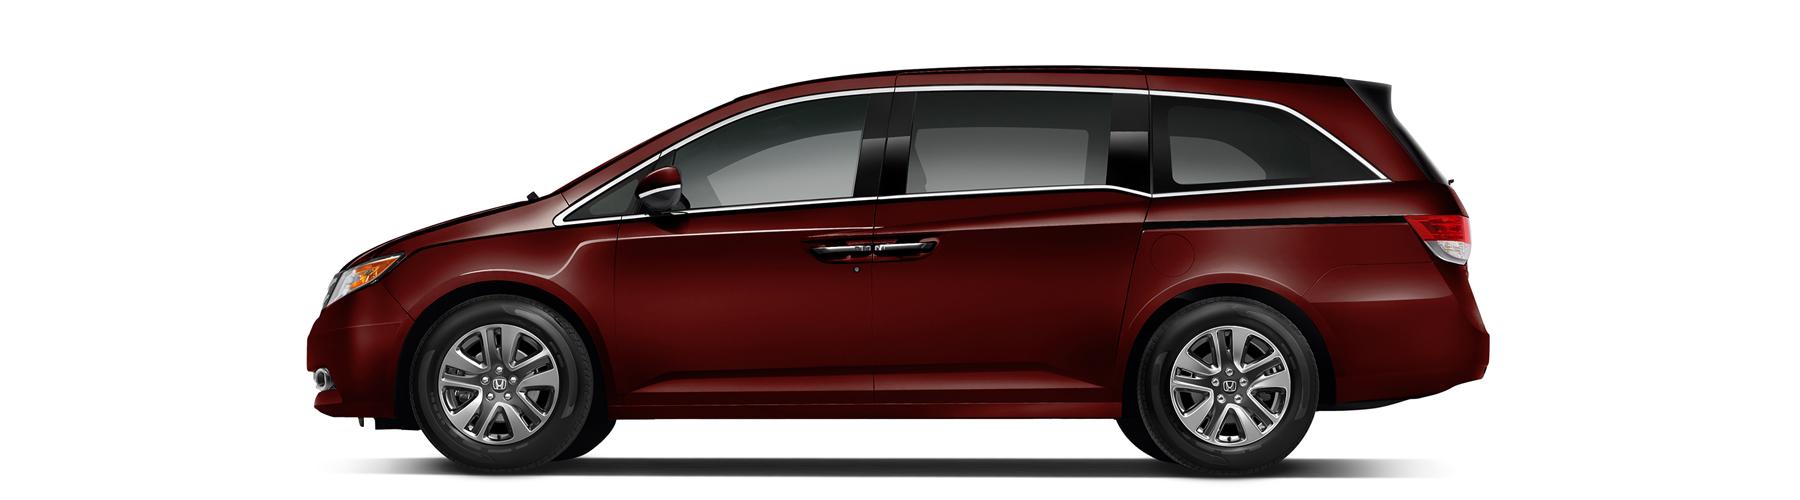 Honda odyssey lease nh 2017 2018 honda reviews for Honda odyssey lease price